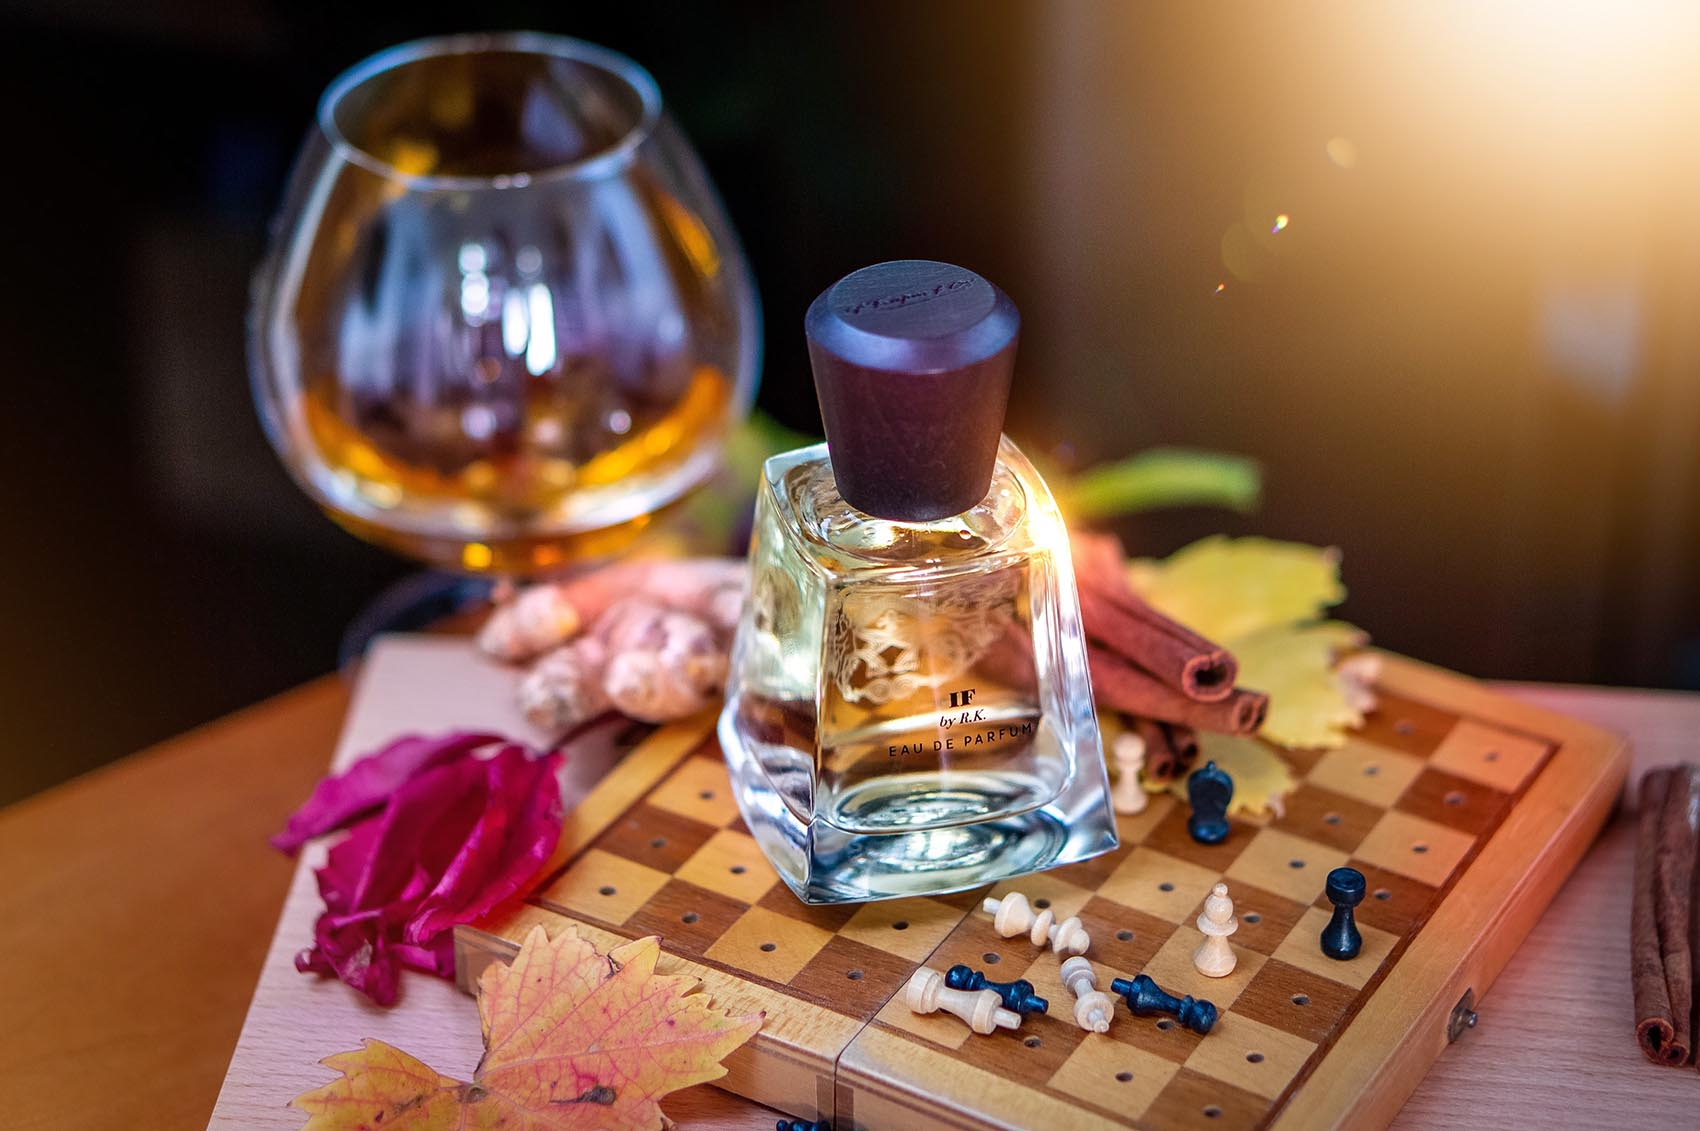 P. Frapin If by R.K. – парфюм к началу года